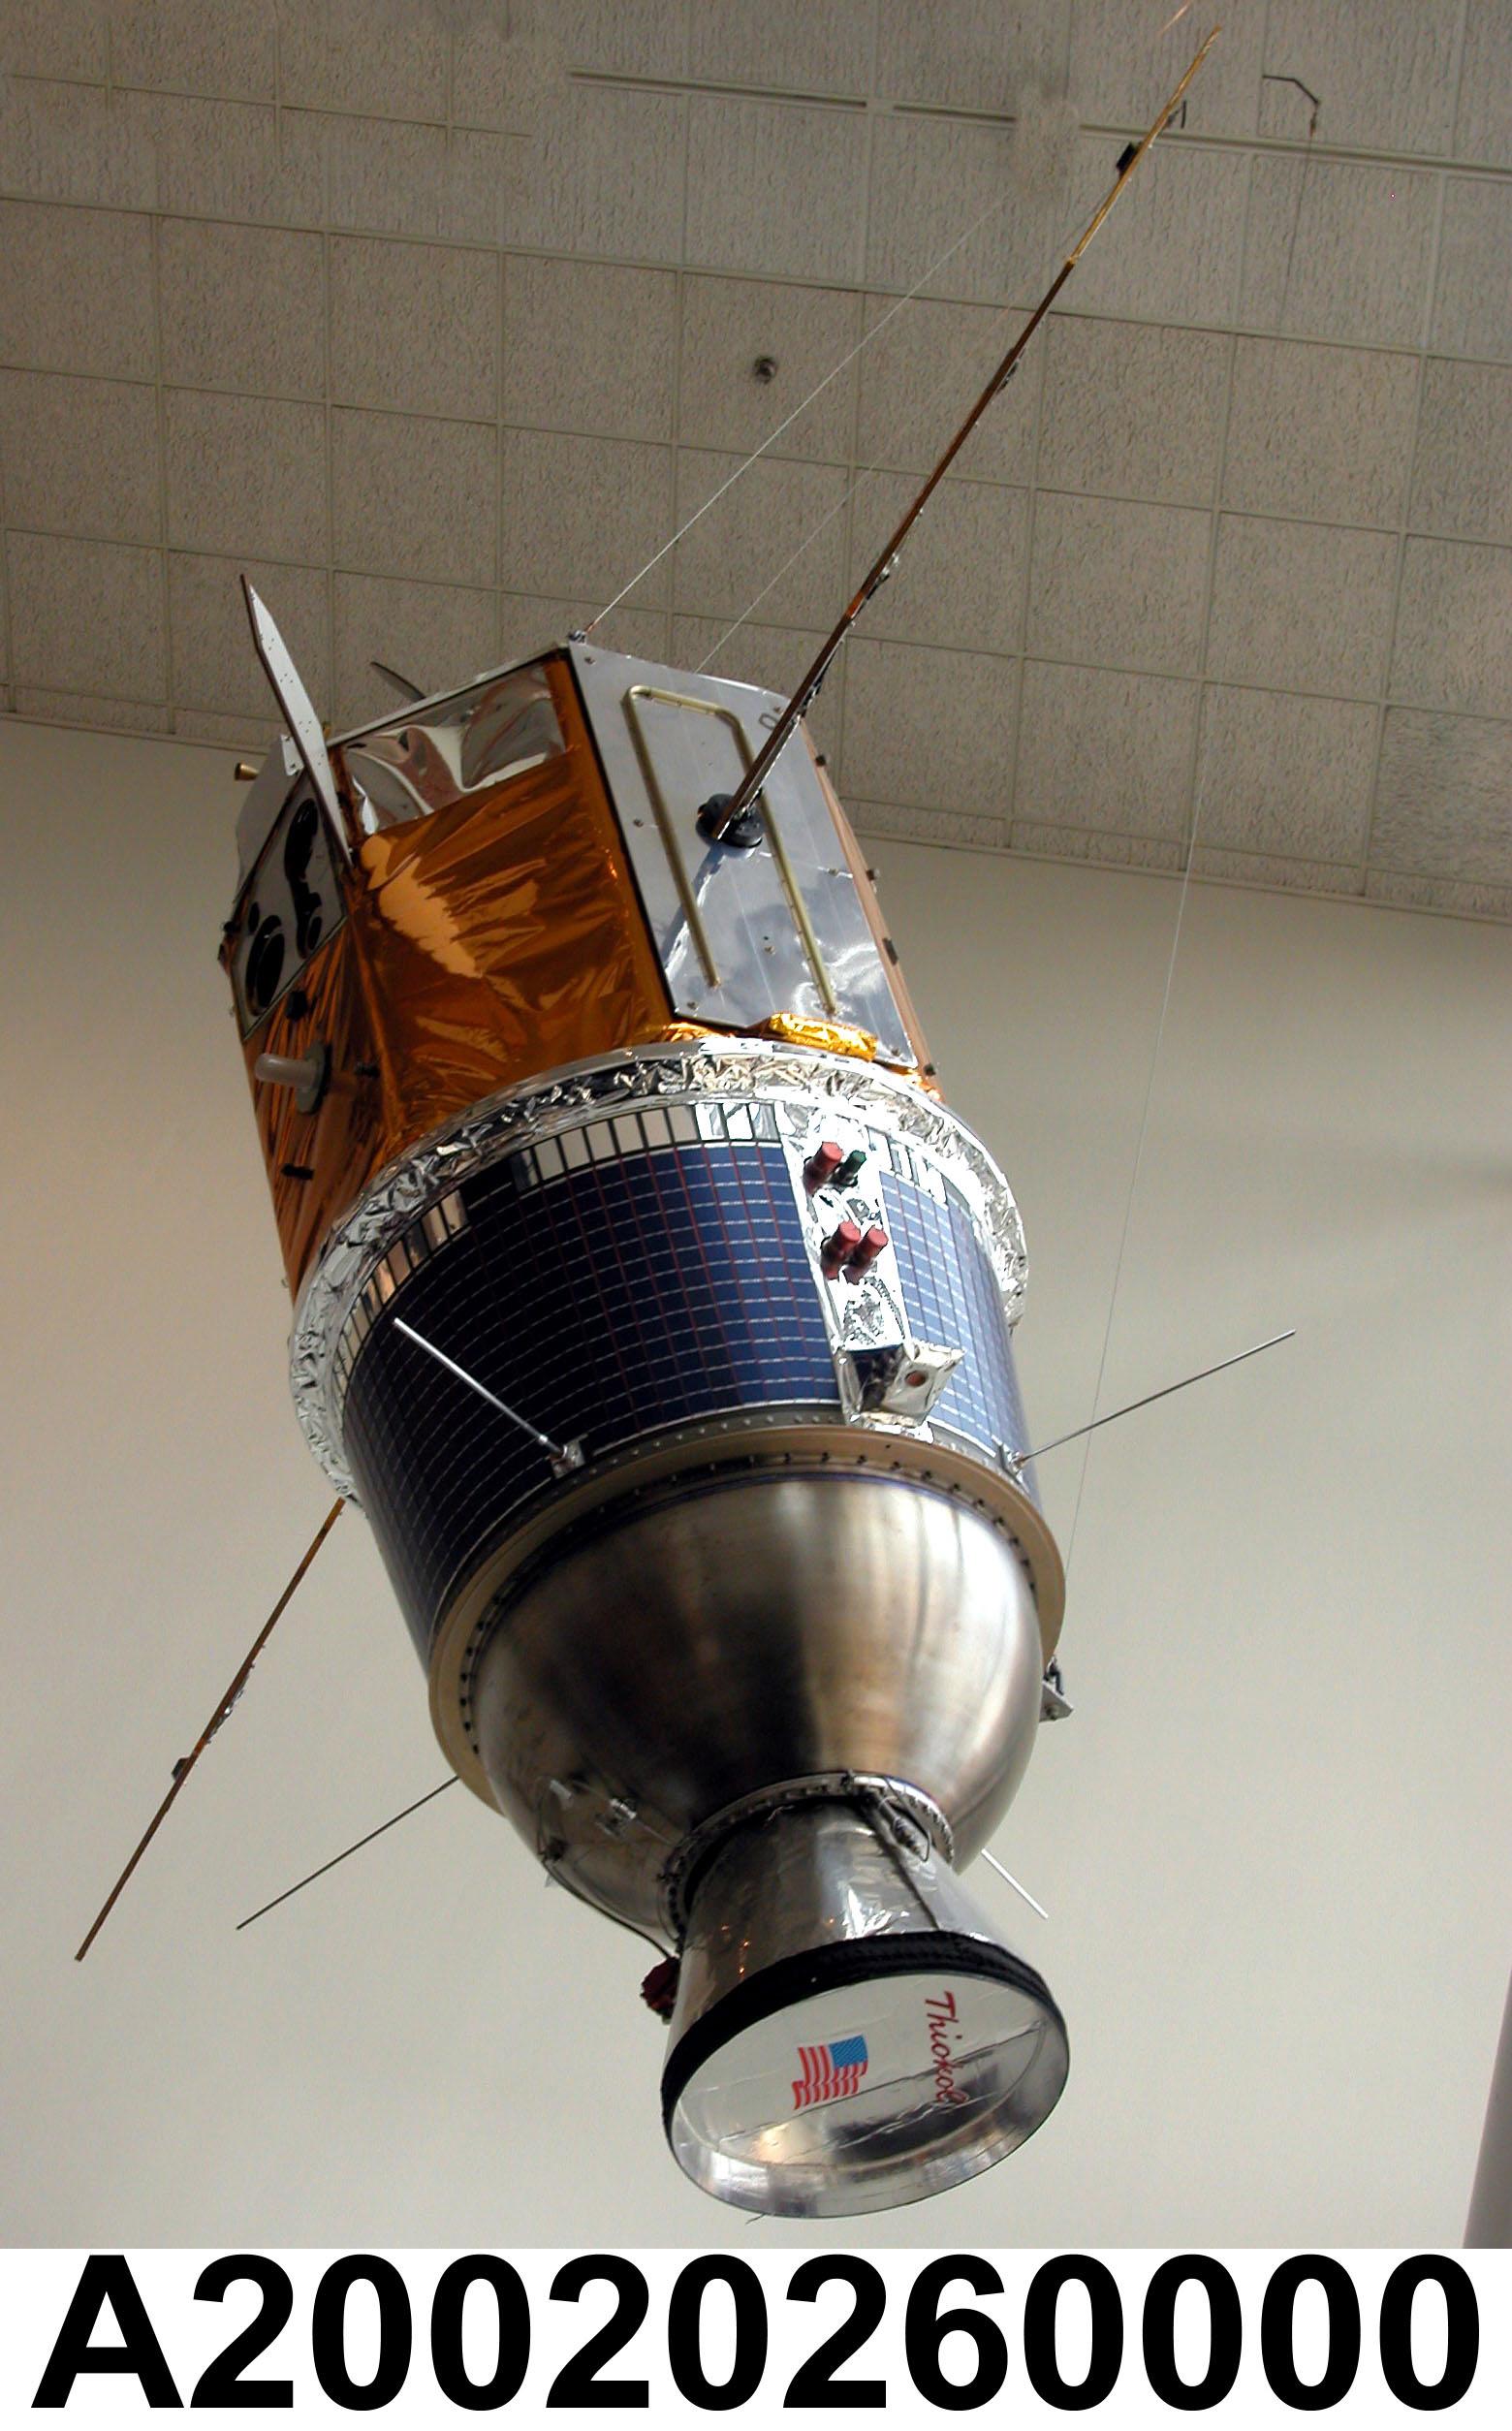 Image of : Spacecraft, Engineering Model, Clementine